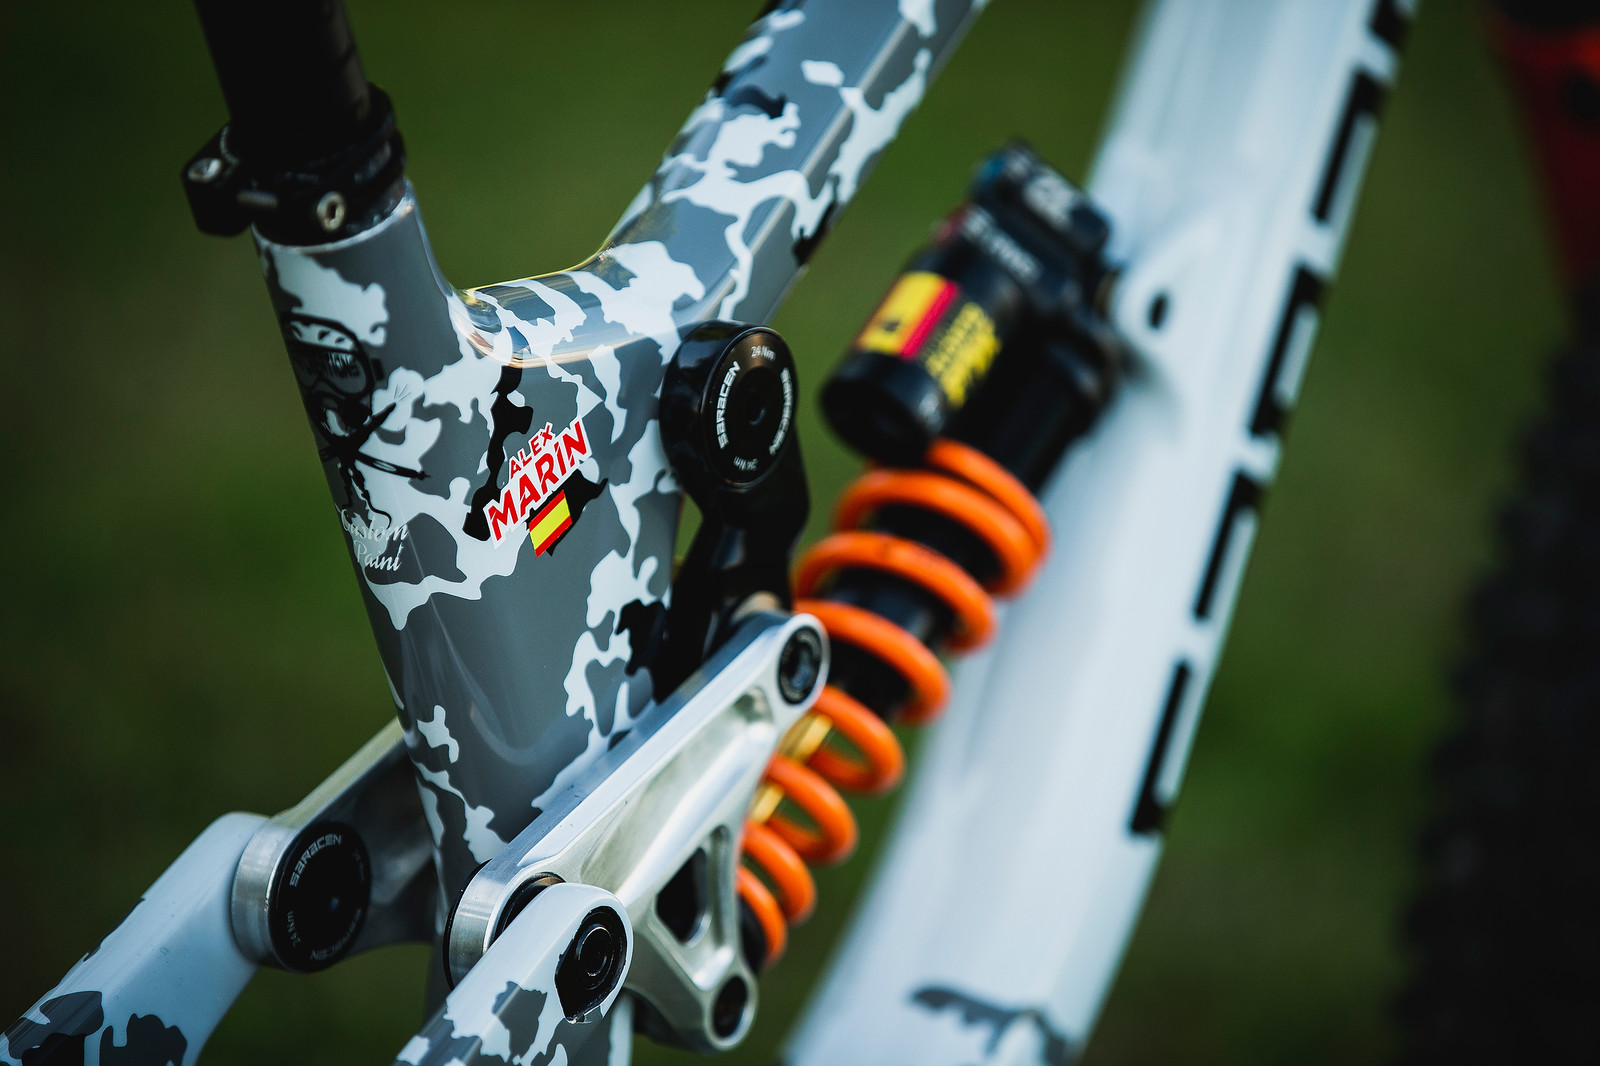 Alex Marin's Saracen Myst at 2019 Worlds MSA - Alex Marin's Saracen Myst at 2019 Worlds MSA - Mountain Biking Pictures - Vital MTB